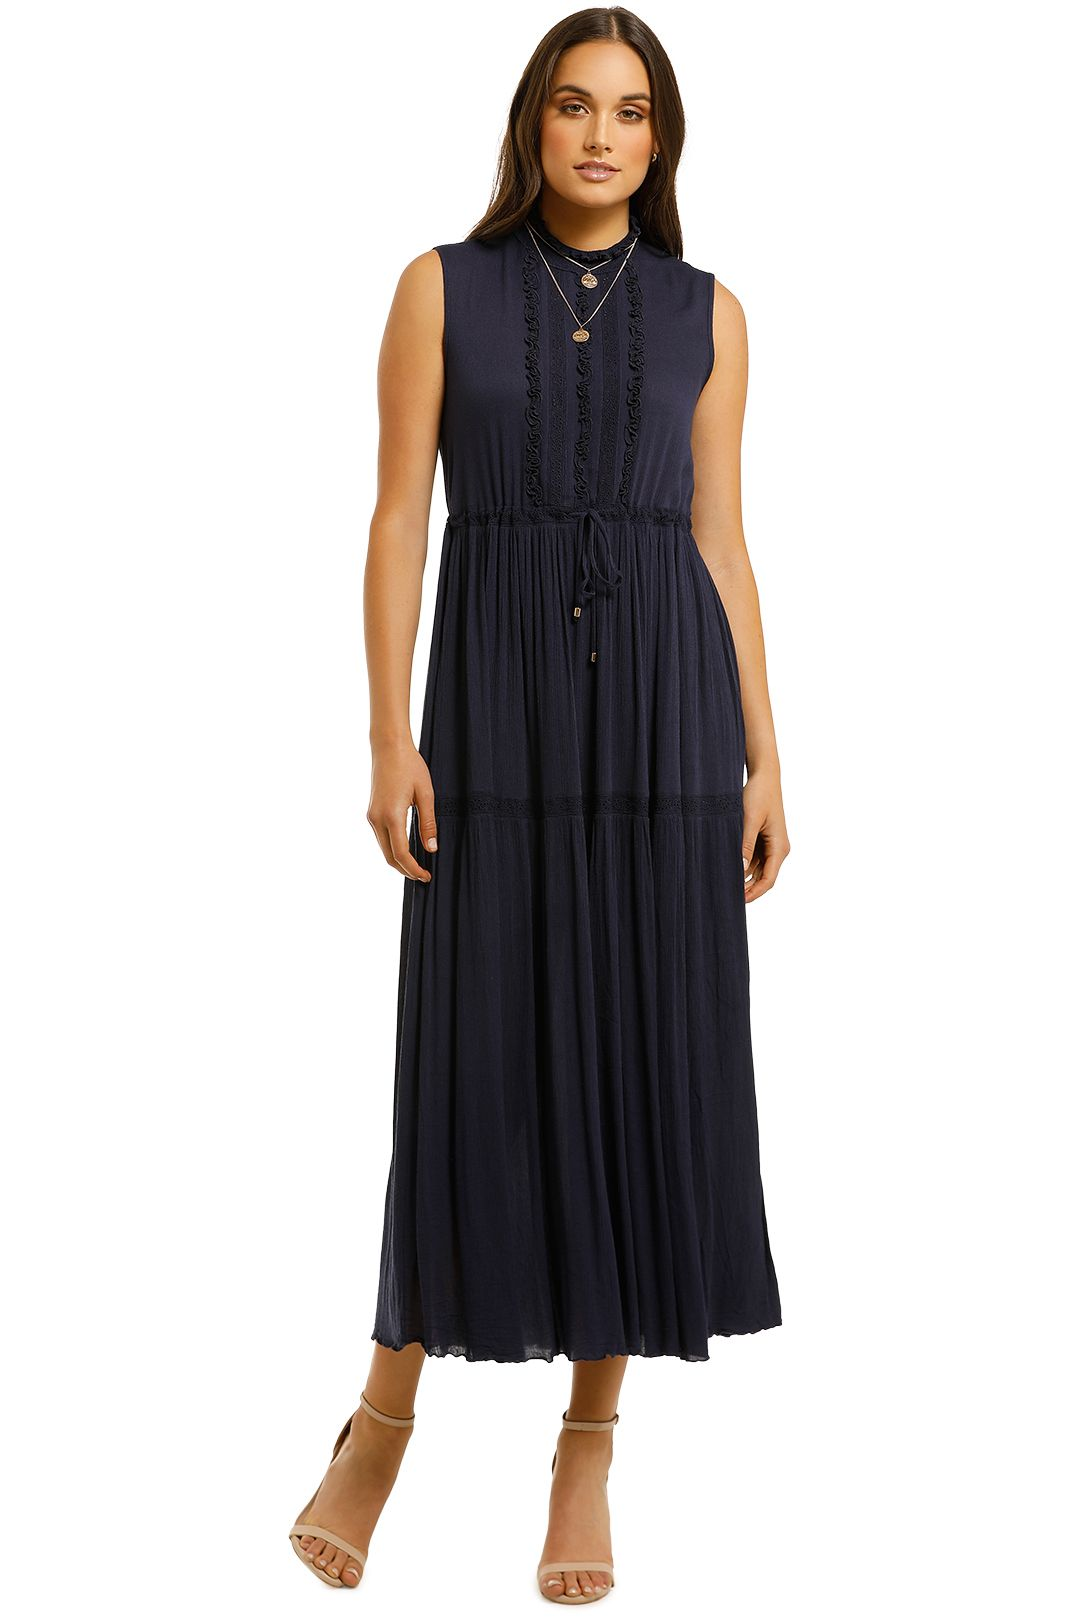 Kate-Sylvester-Sea-Breeze-Tea-Dress-Navy-Front